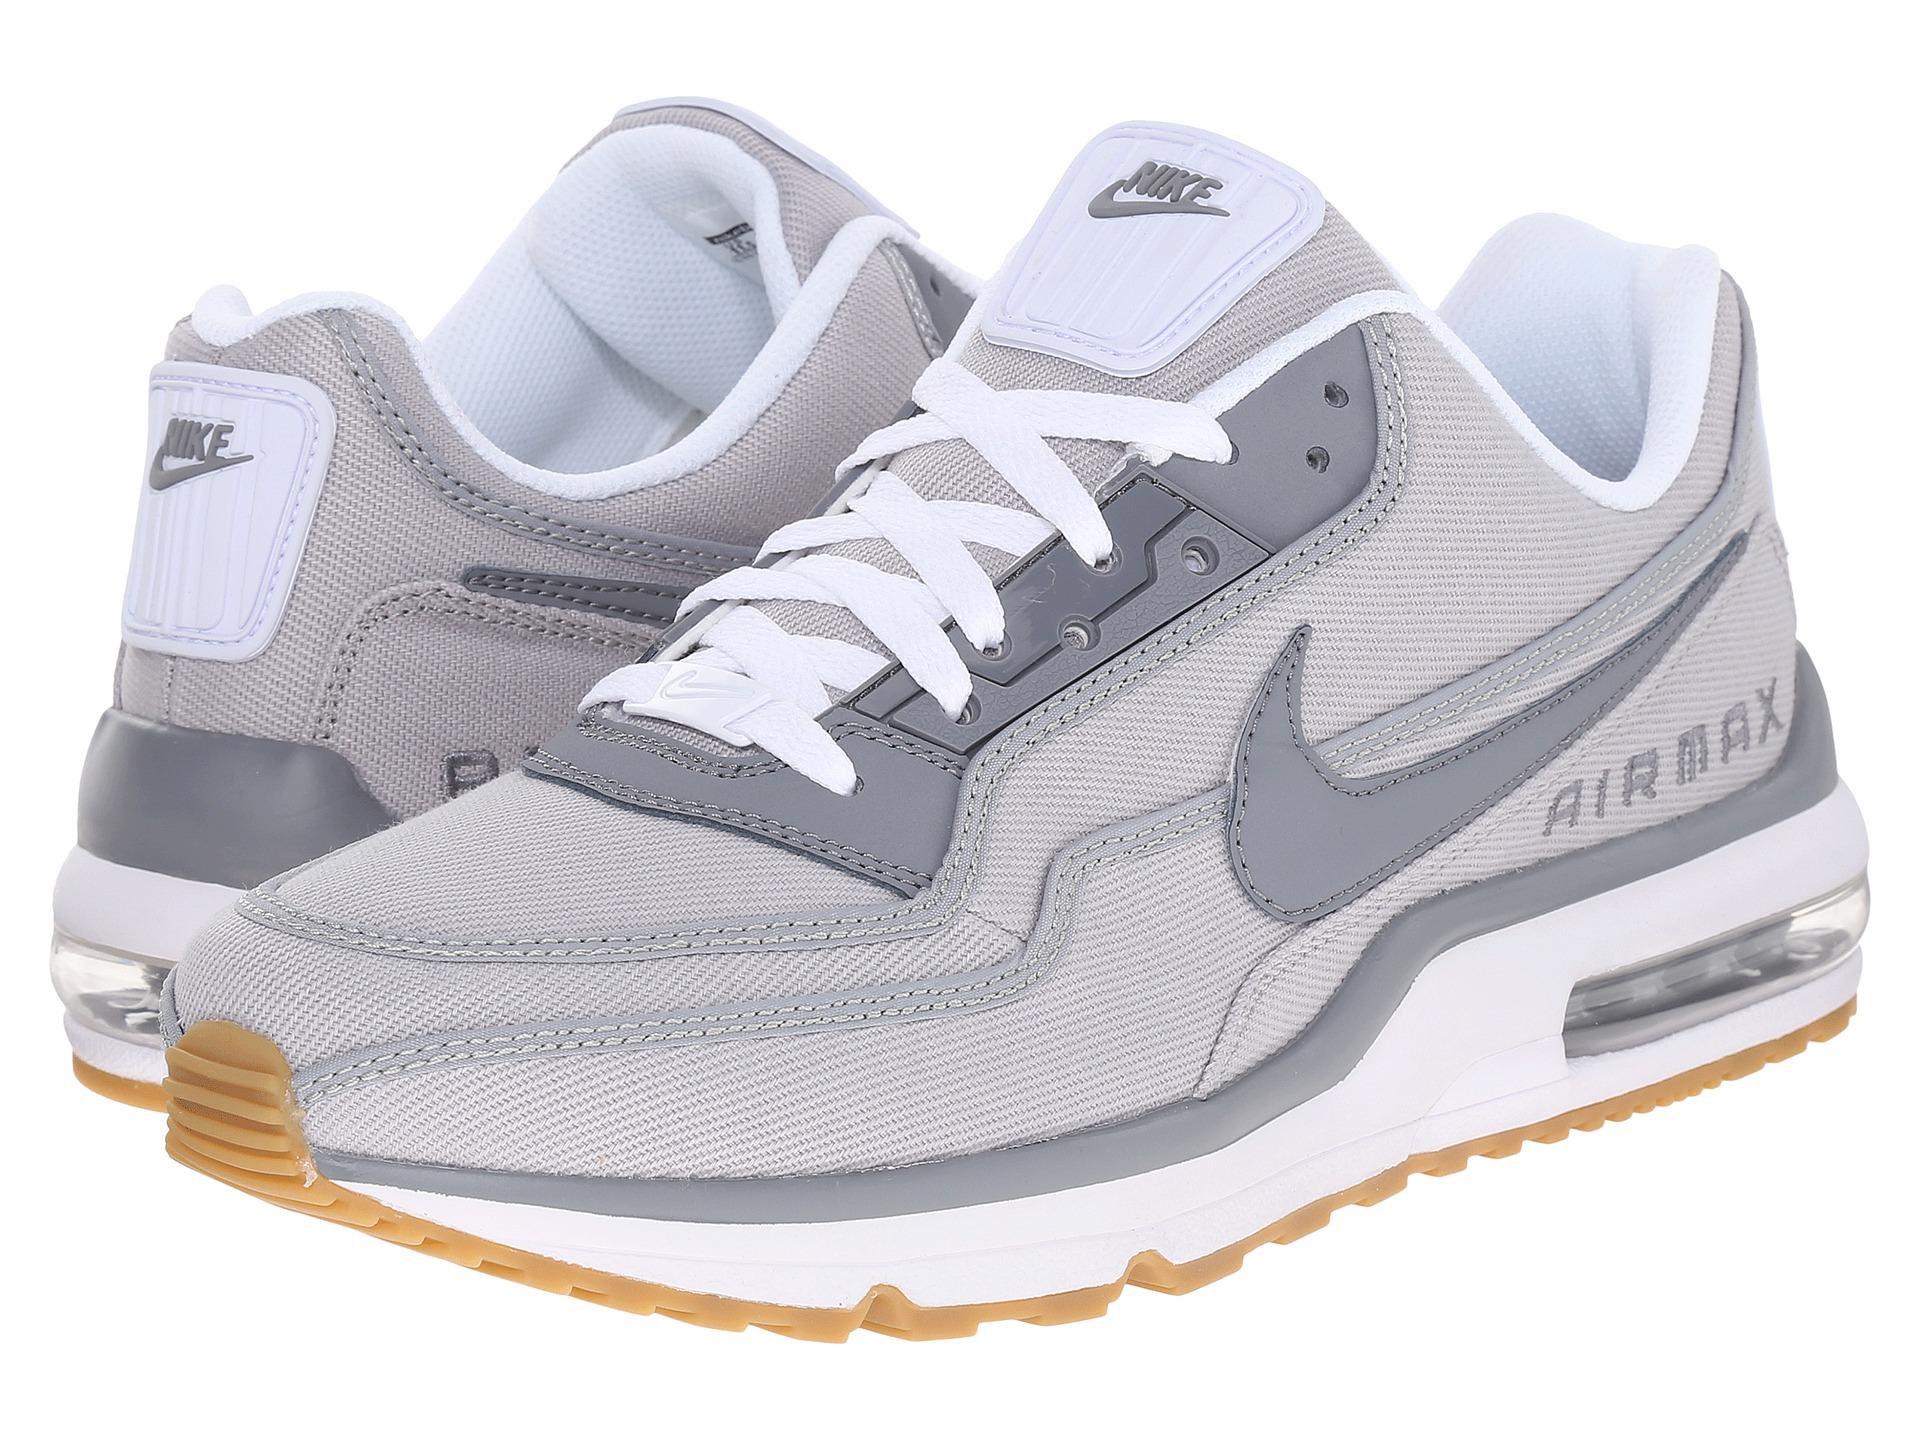 48eeef87251 nike air max ltd 3 txt wolf grey white gum light brown cool grey on ...